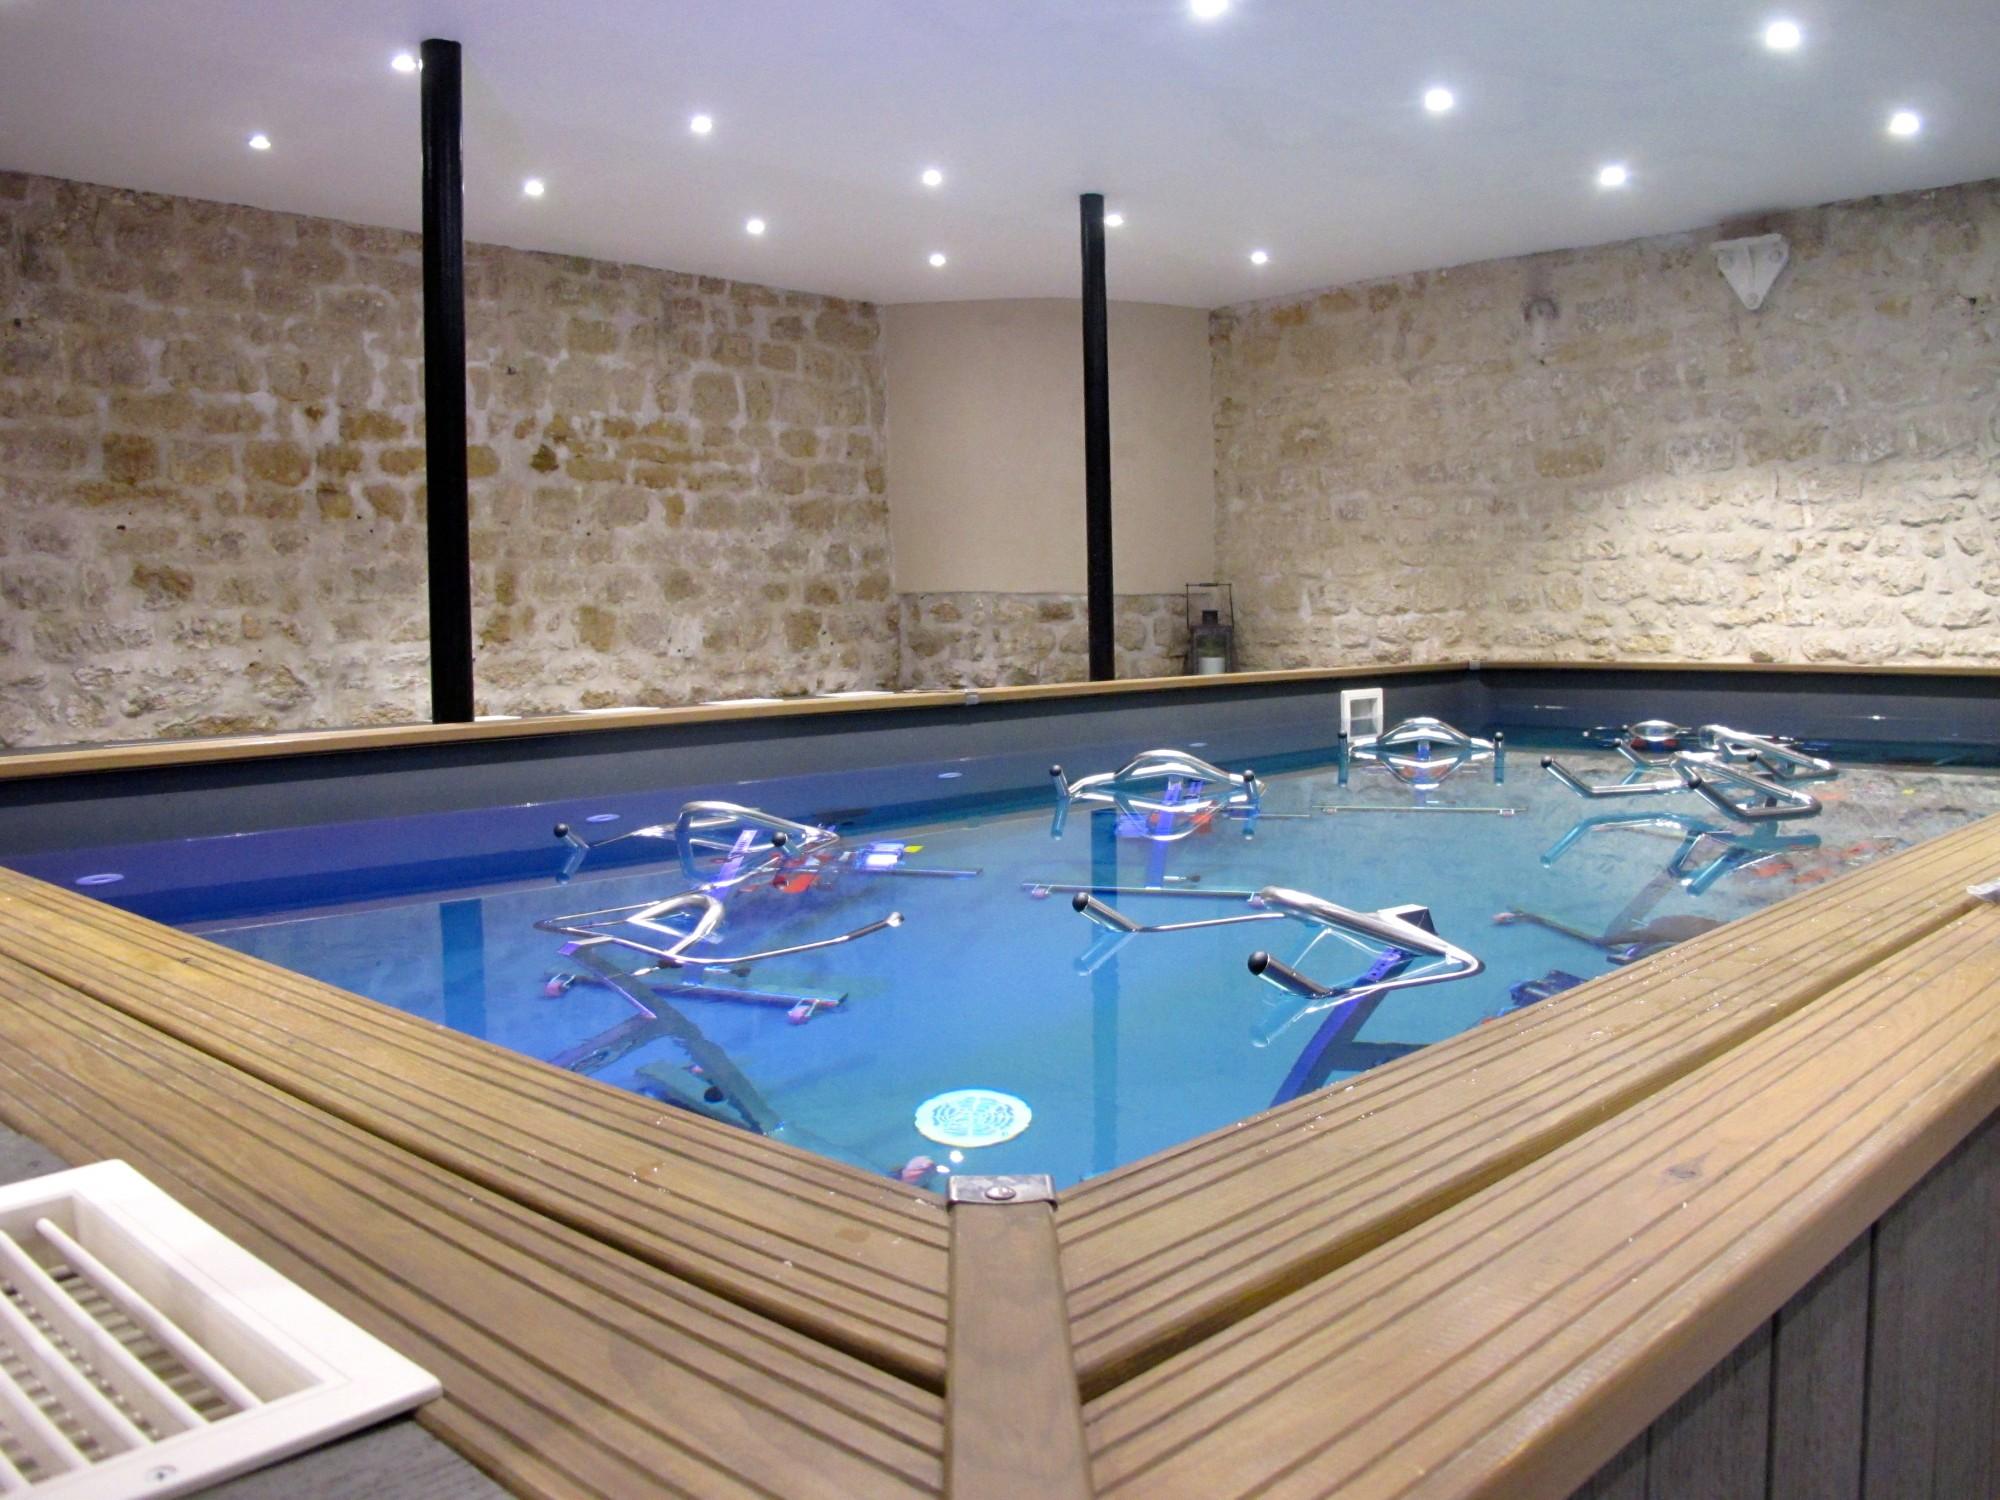 Atelier mood l 39 aquabiking l 39 honneur the parisienne - Aquabiking piscine keller ...